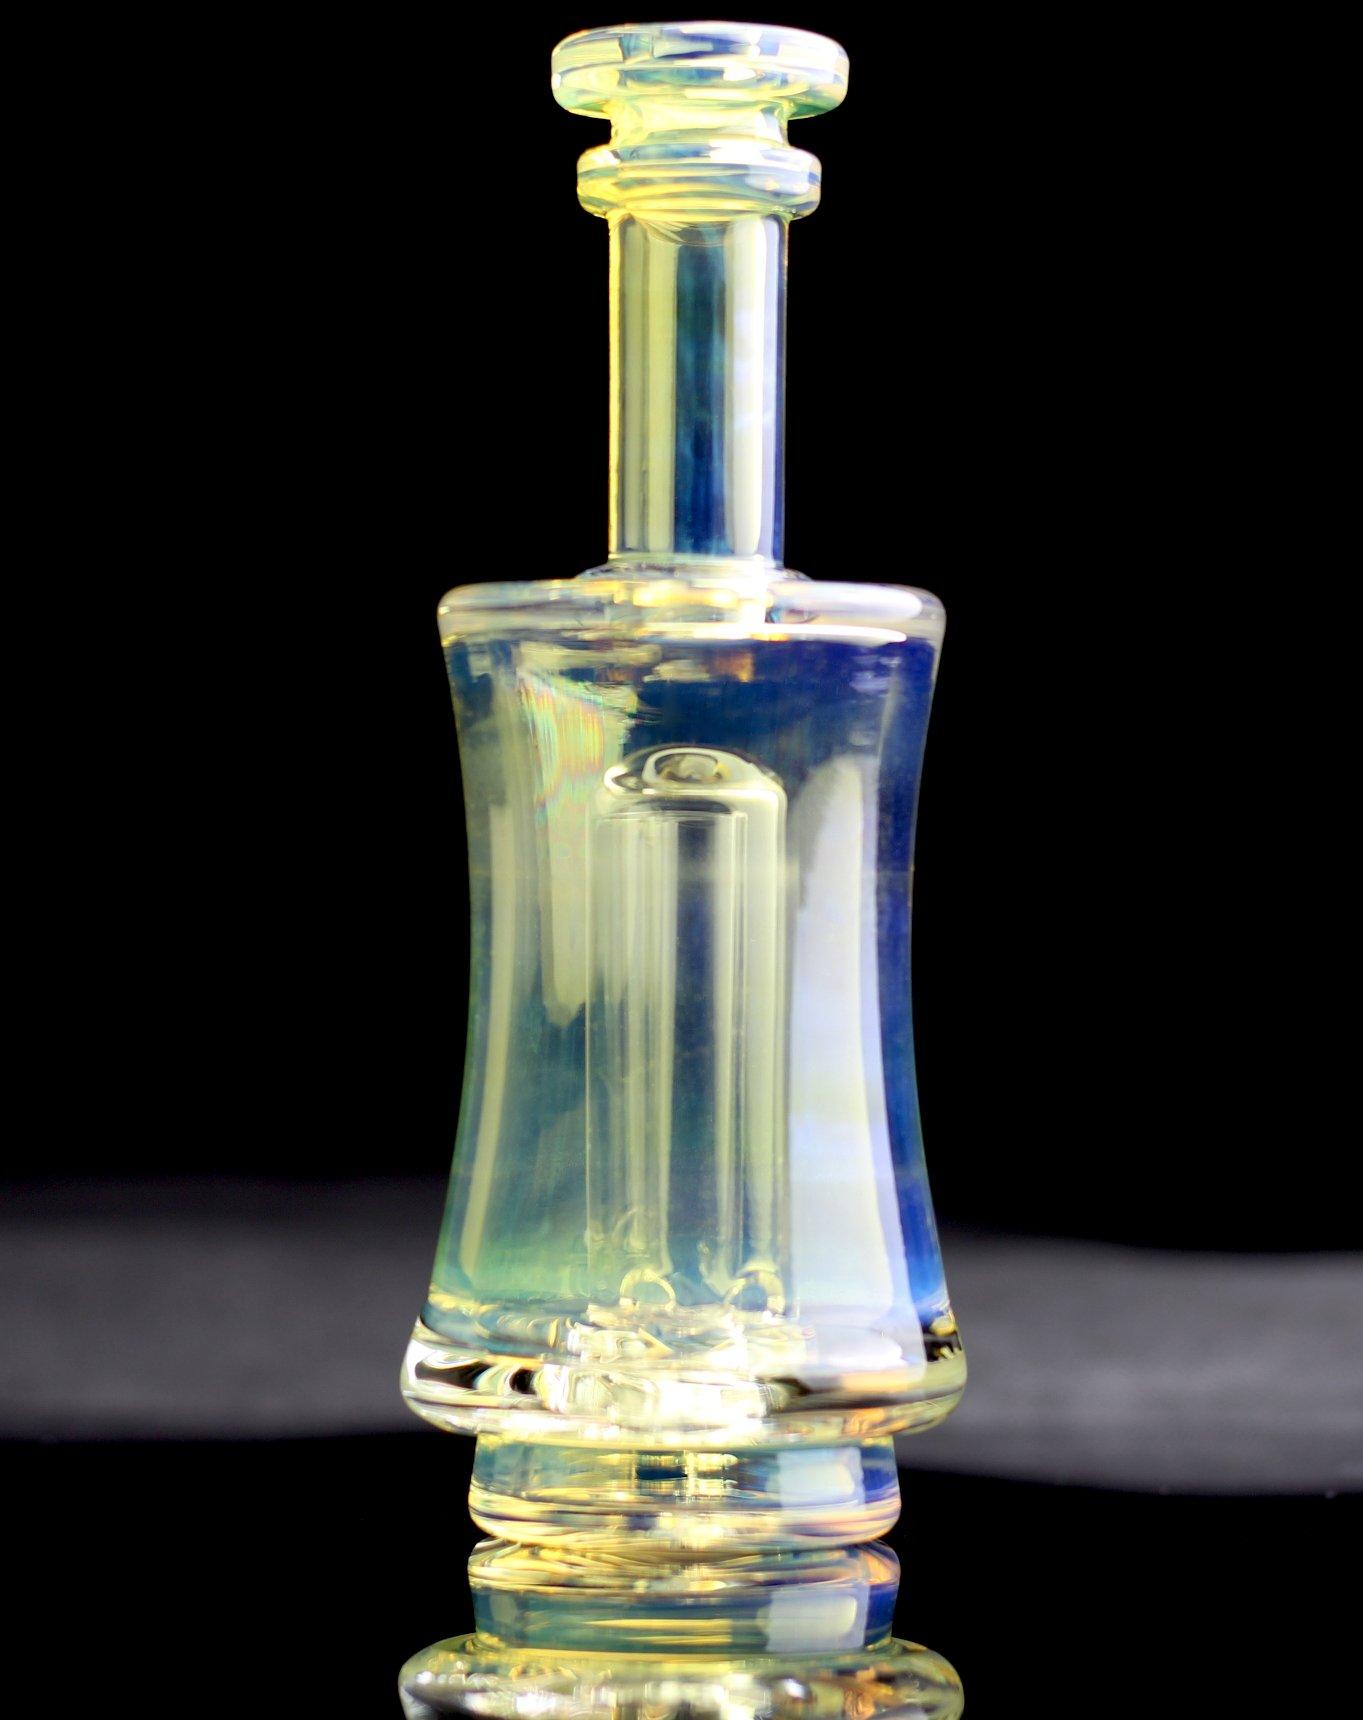 Image of Puffco Peak/FocusV Carta Silver Fume Attachment